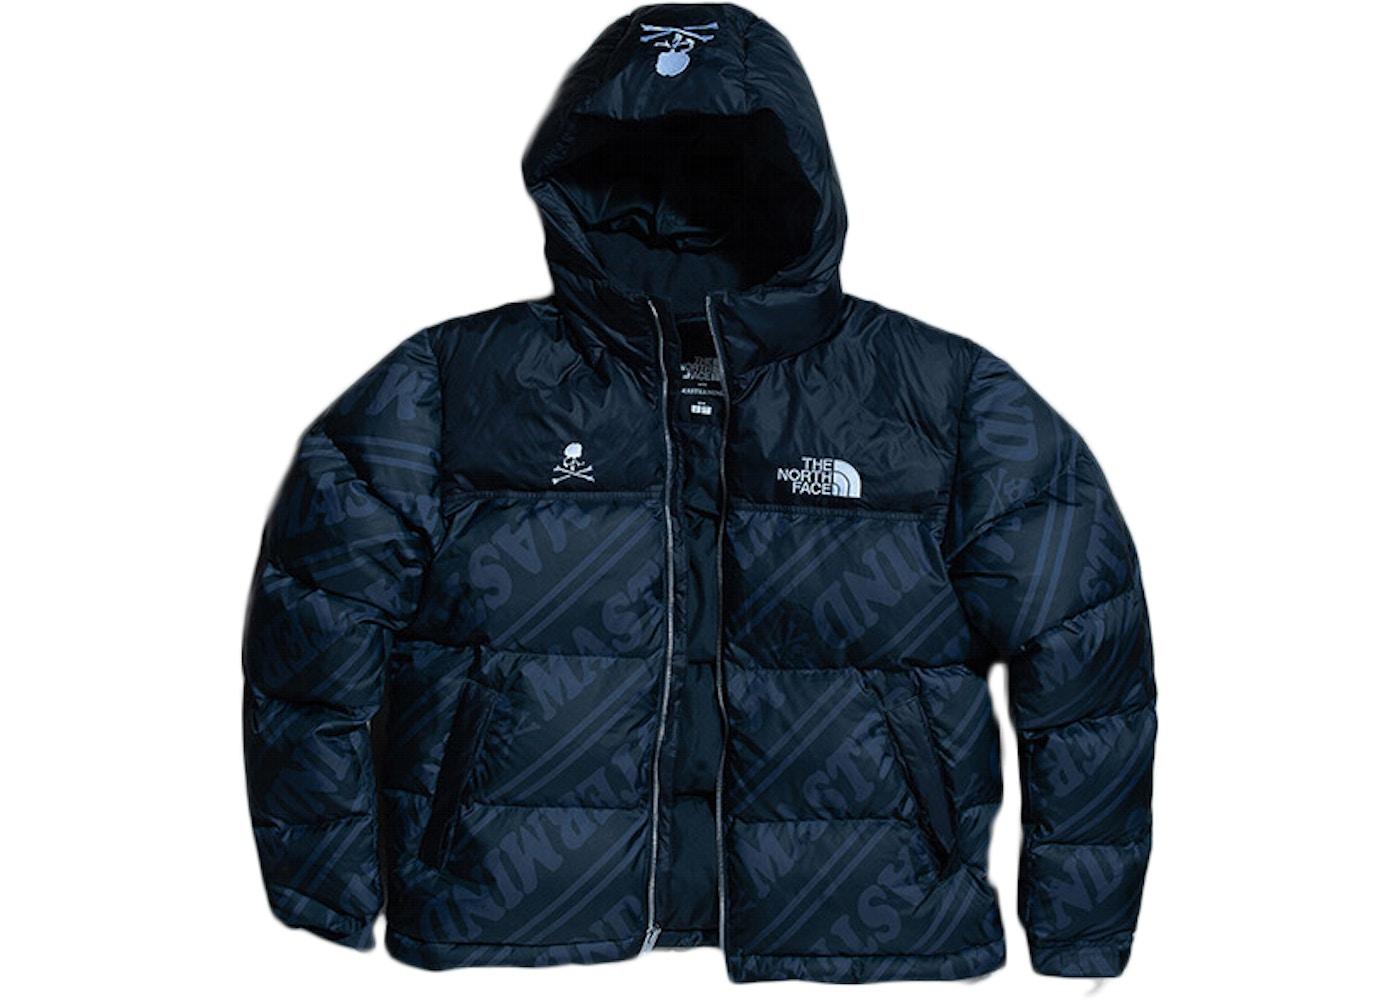 2332ab040 Mastermind The North Face Nuptse Jacket Black • Buy/Sell on StockX